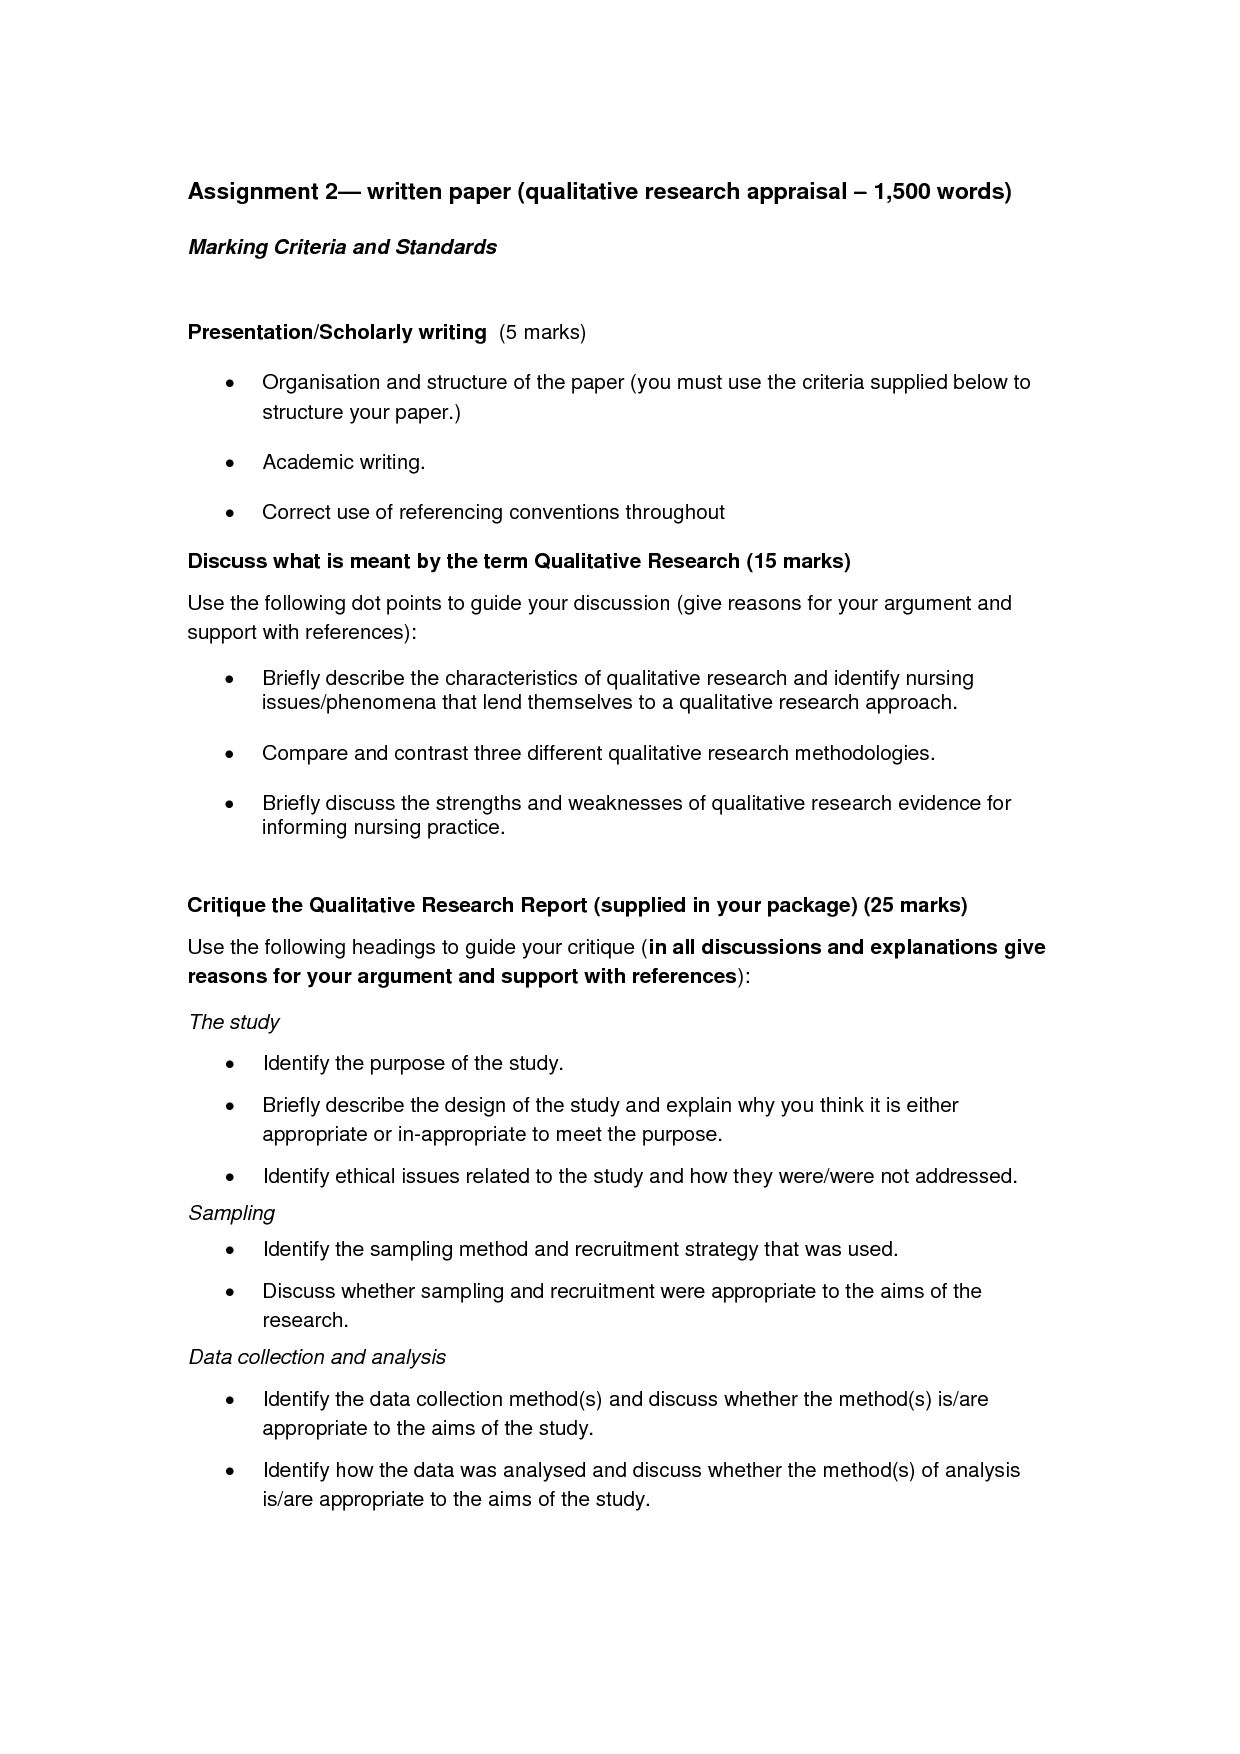 Apa qualitative research paper sample professional university essay writer site uk